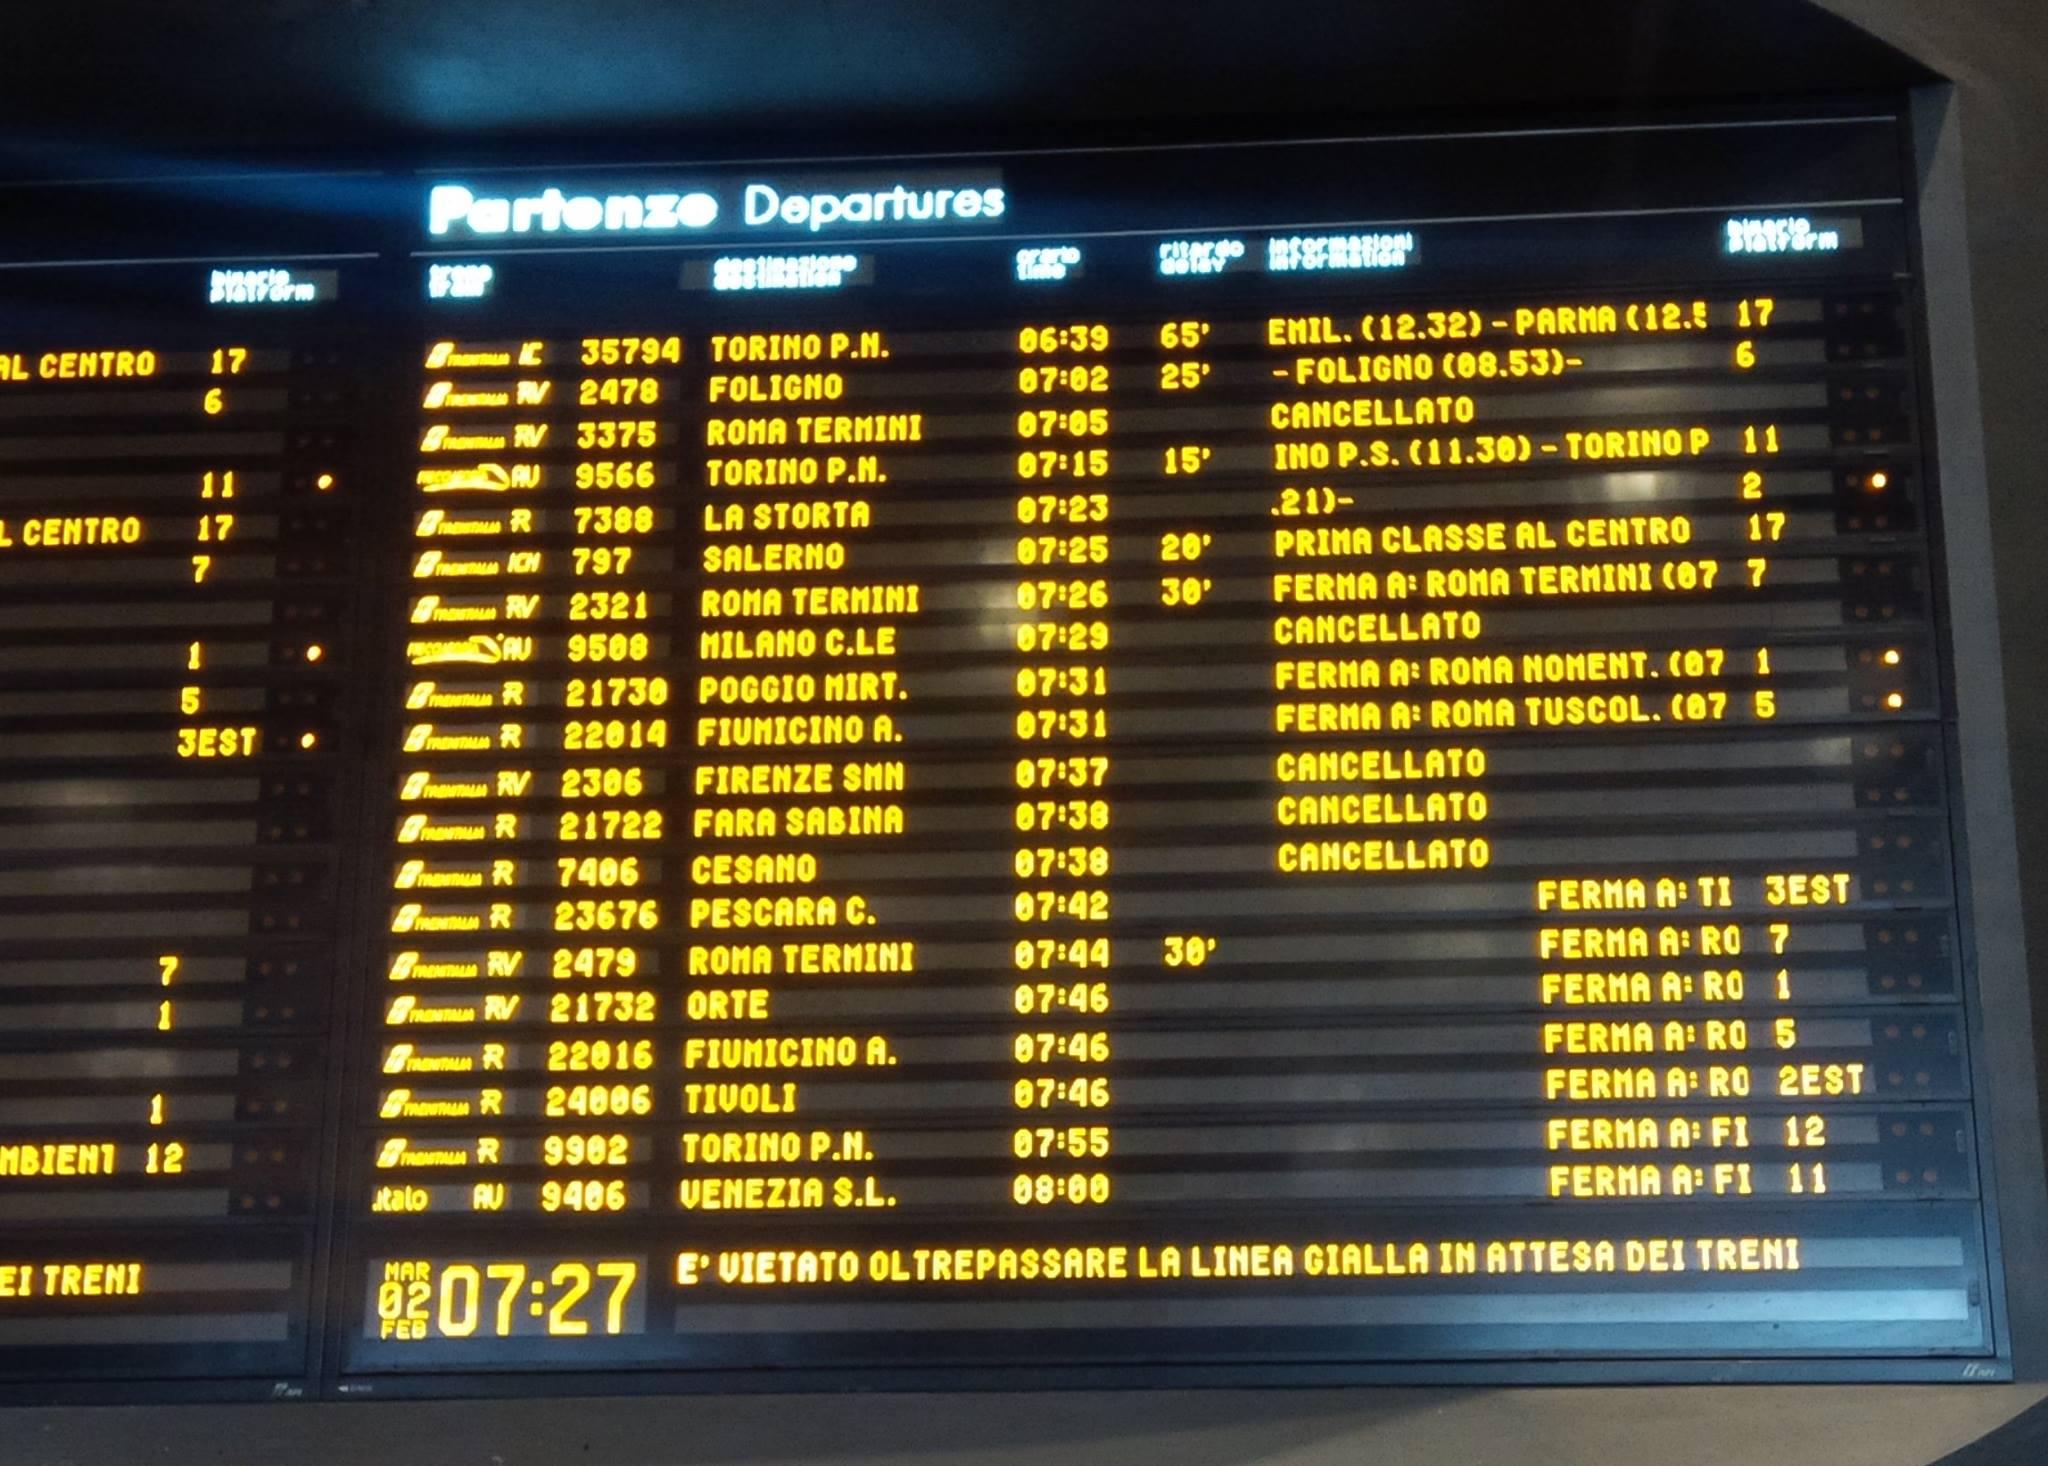 Ferrovie, ritardi per i regionali e giornata di passione per i passeggeri